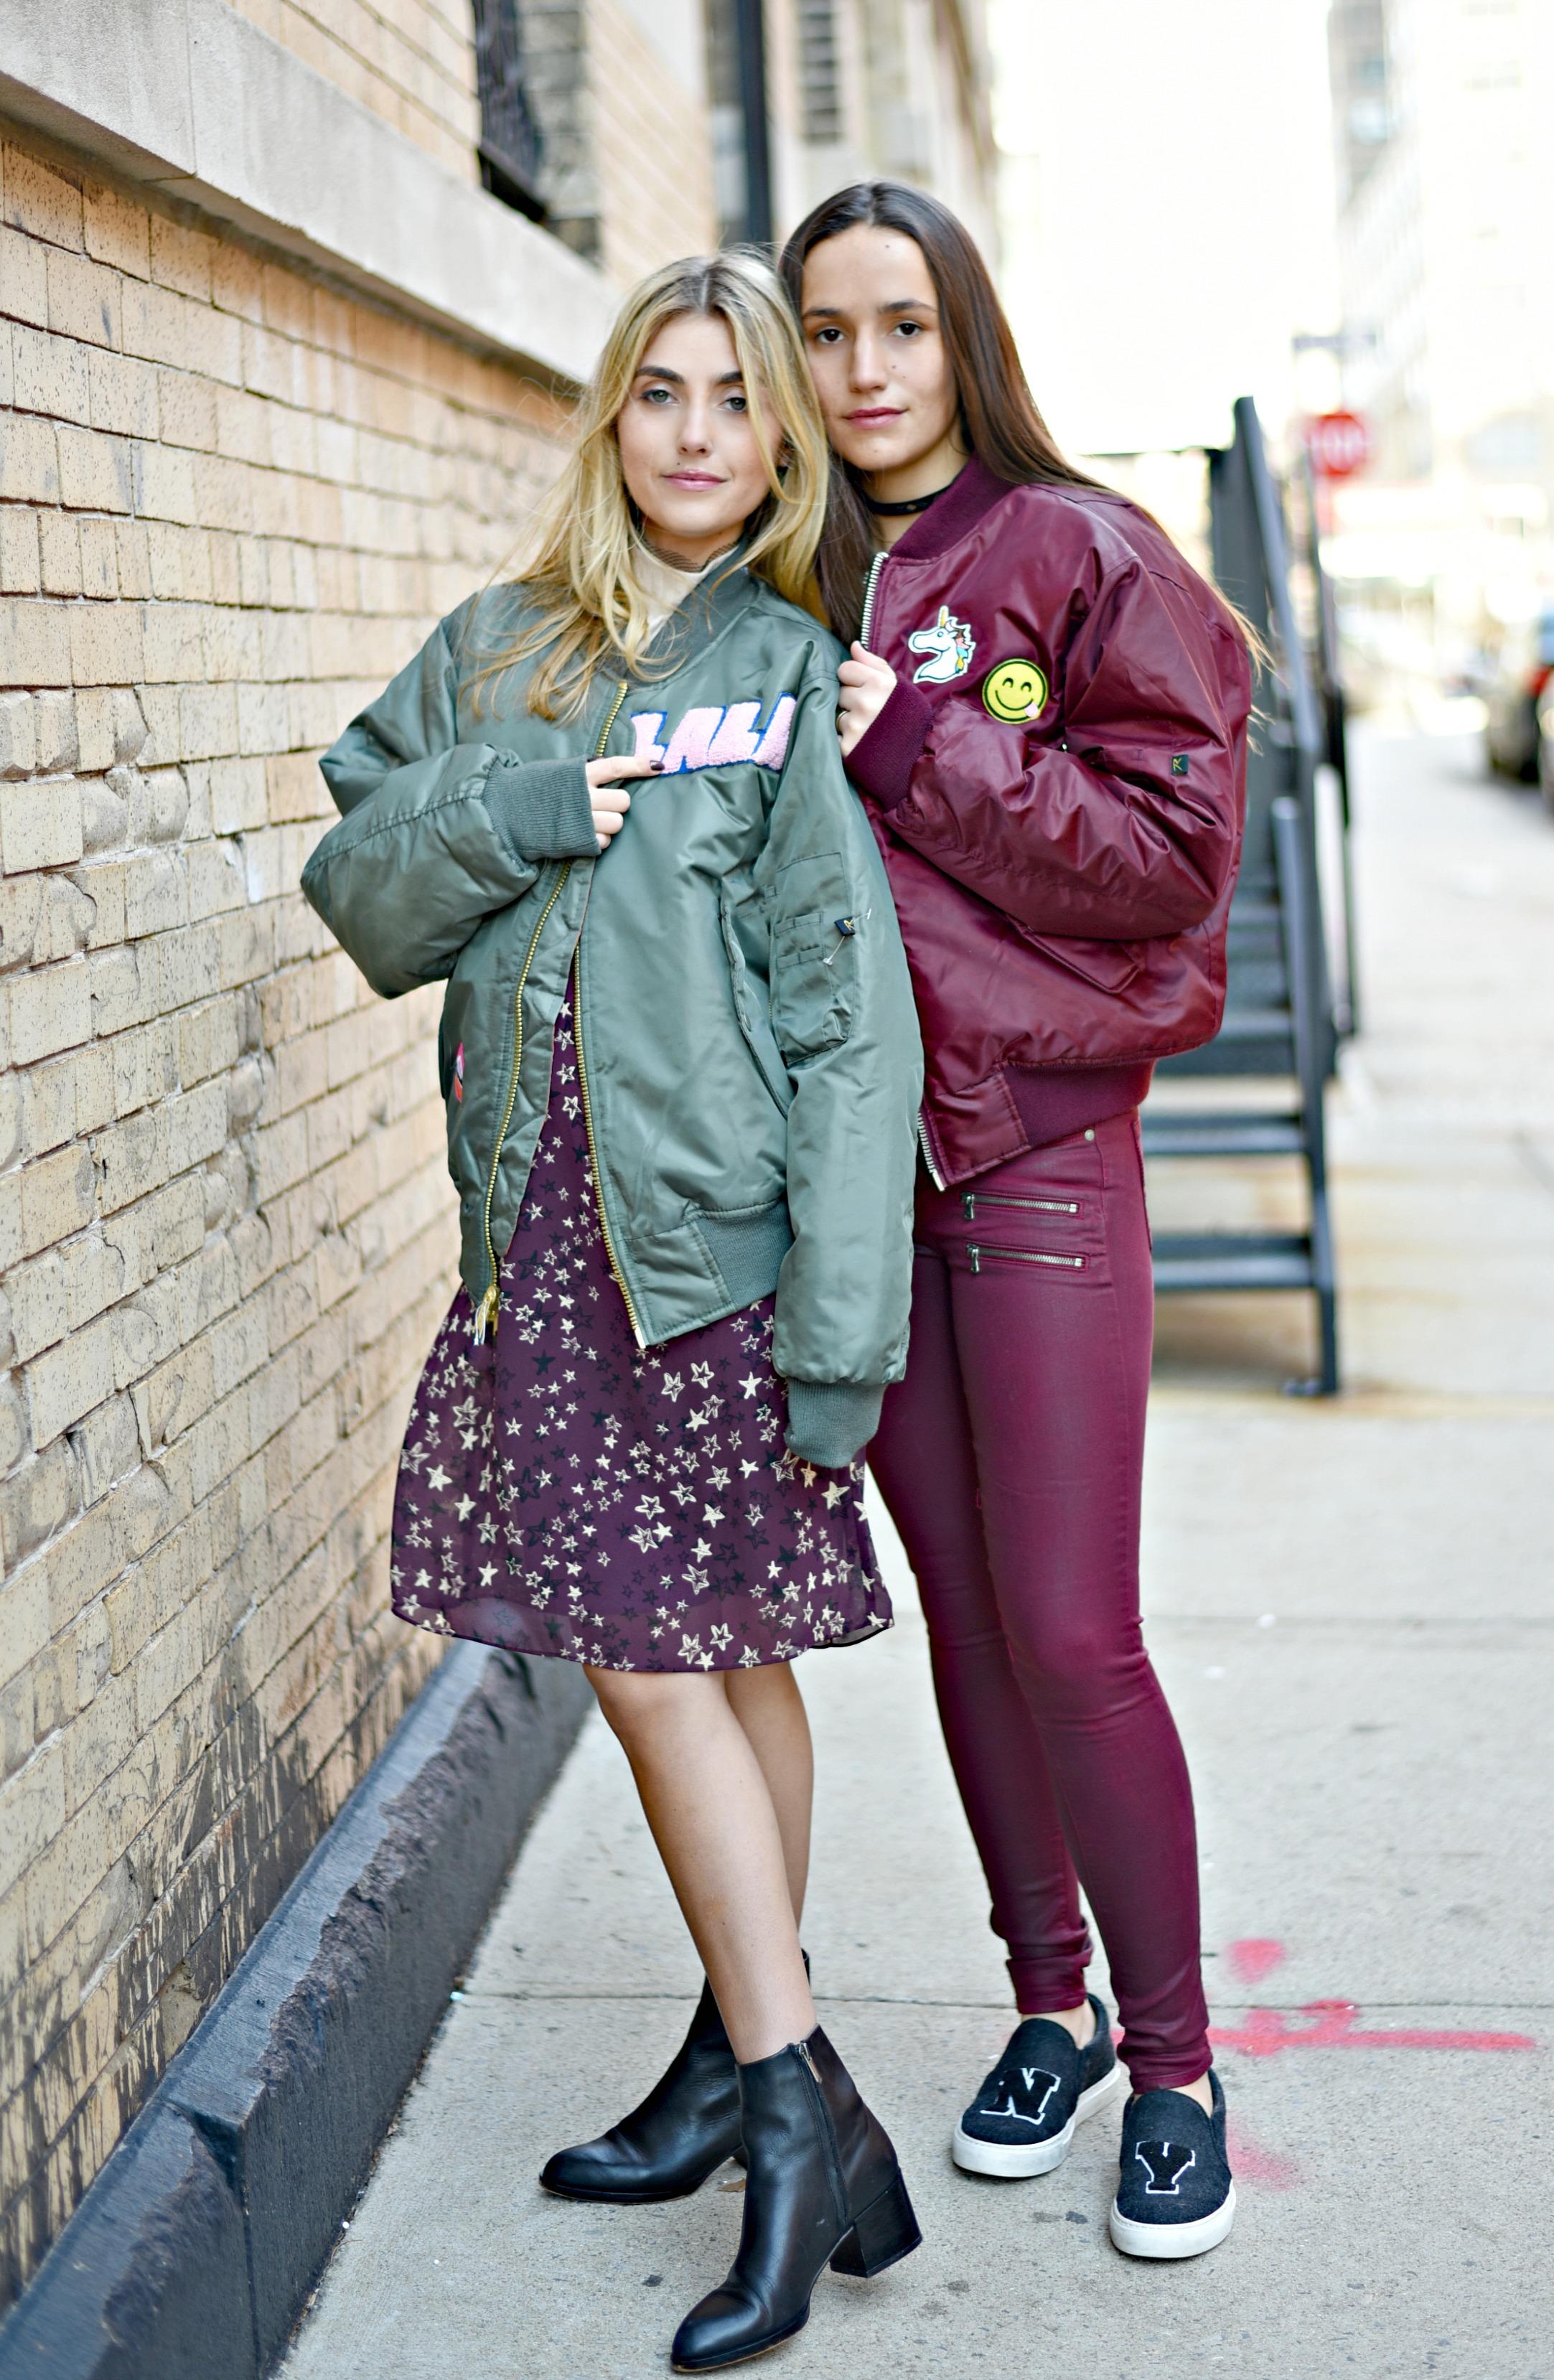 SOPHIE & CHARLOTTE BICKLEY YIN 2MY YANG SISTER FASHION BLOGGERS NYC UNEMPLOYED DENIM POST 1j.jpg